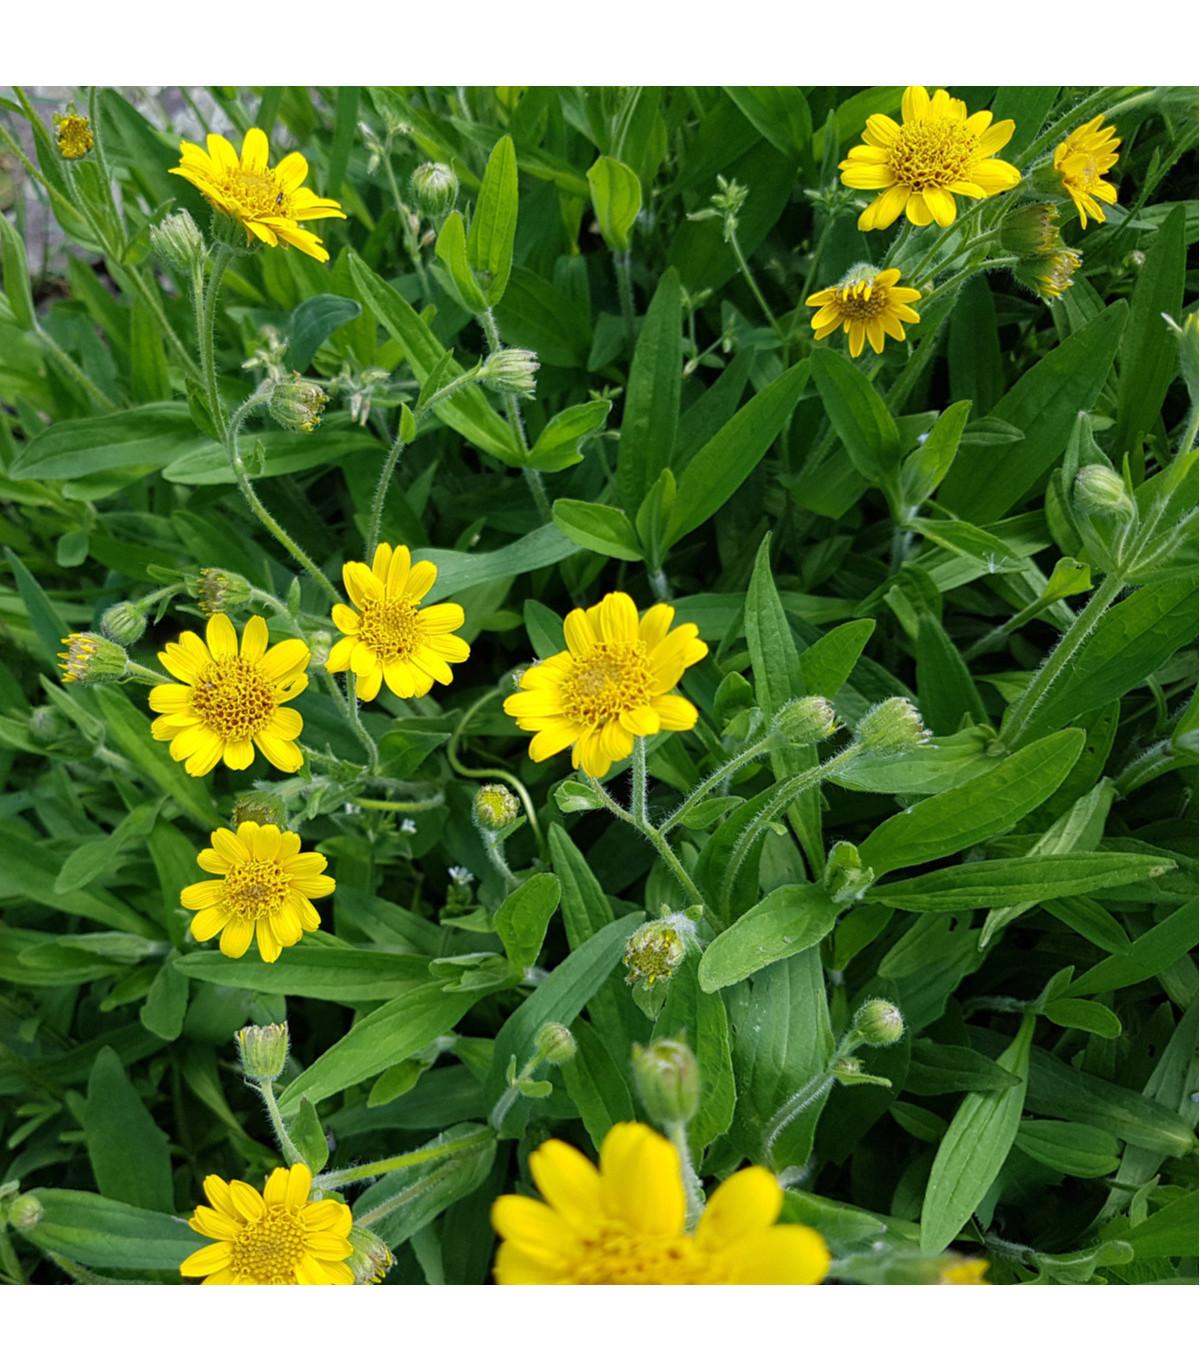 Prha léčivá - Arnika léčivá - Arnica chamissonis - prodej semen léčivek - 13 ks